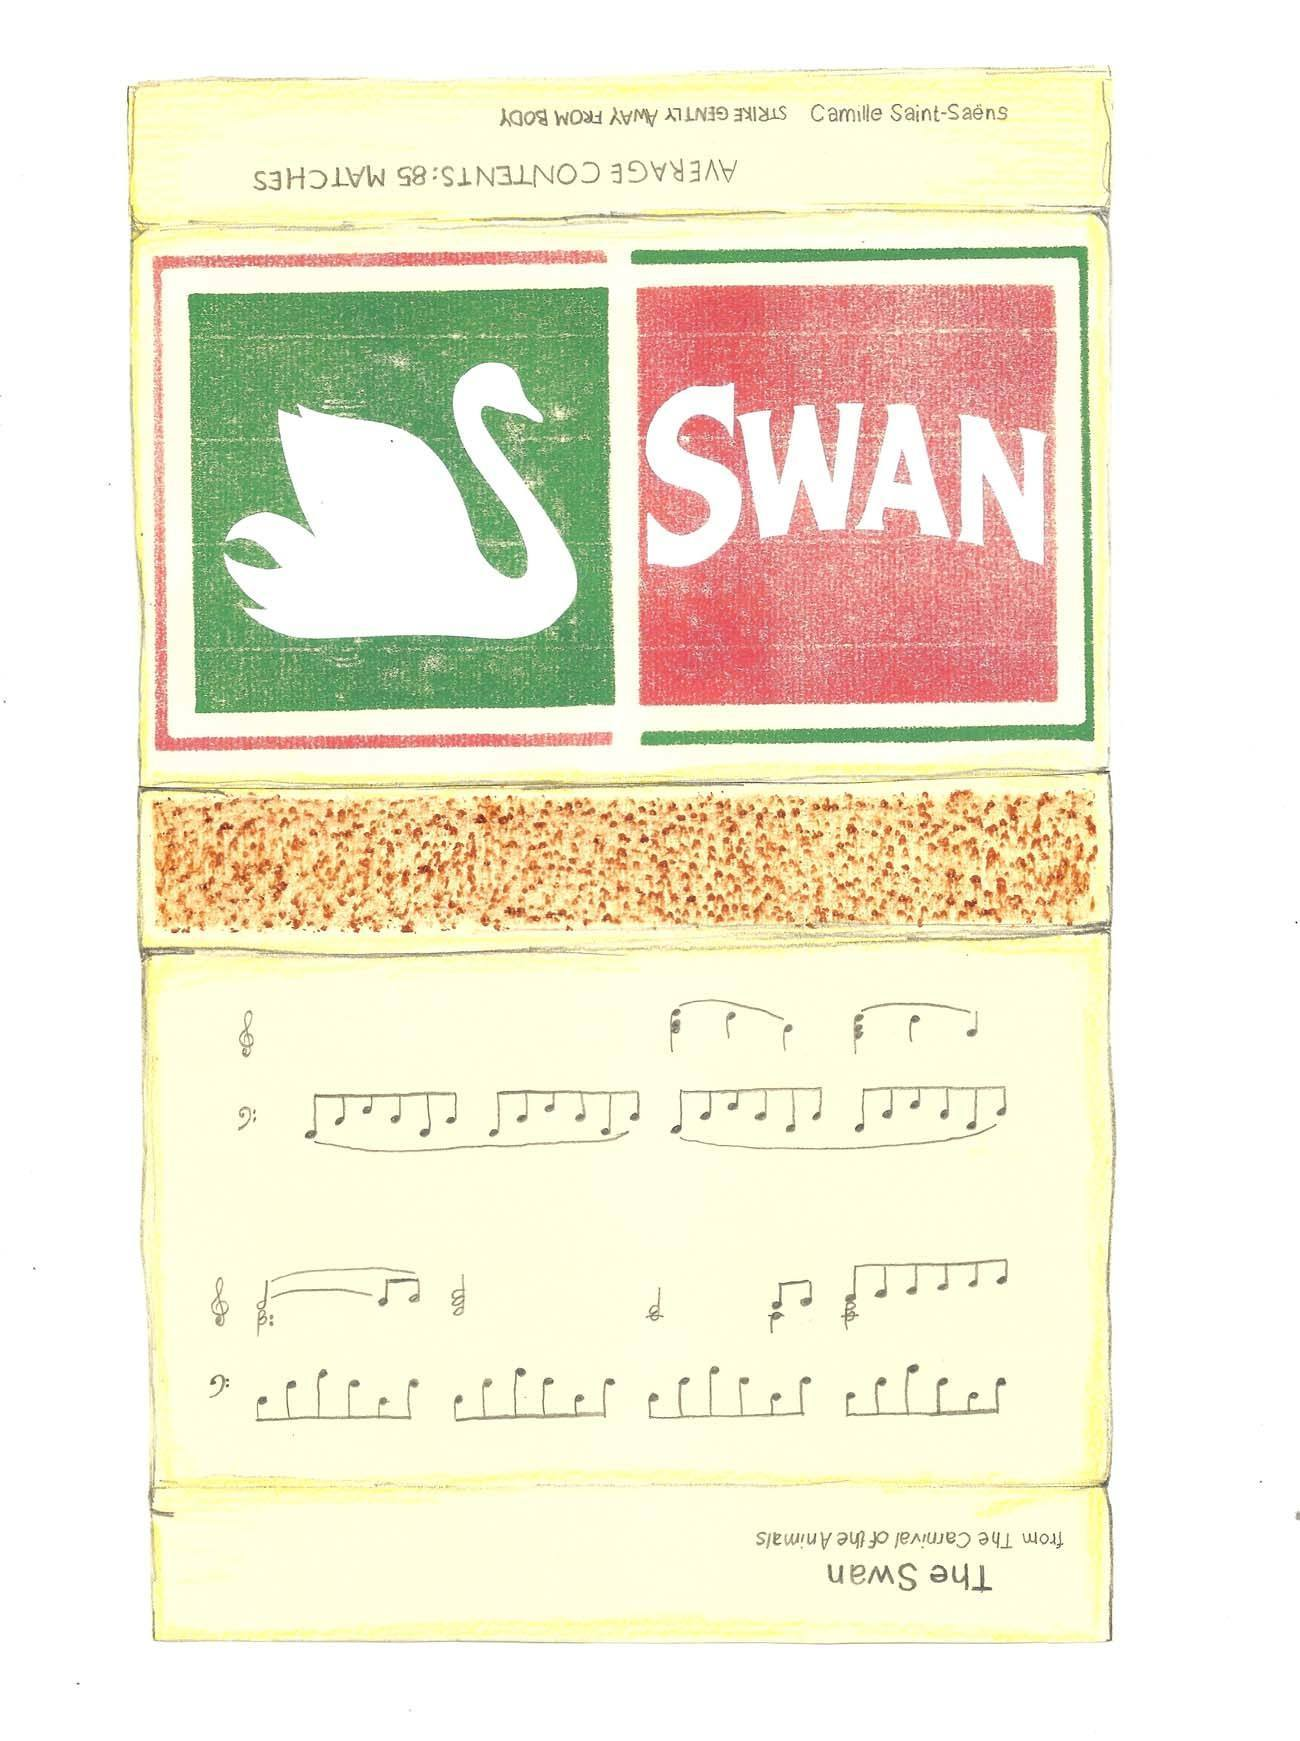 zb swan song.jpg